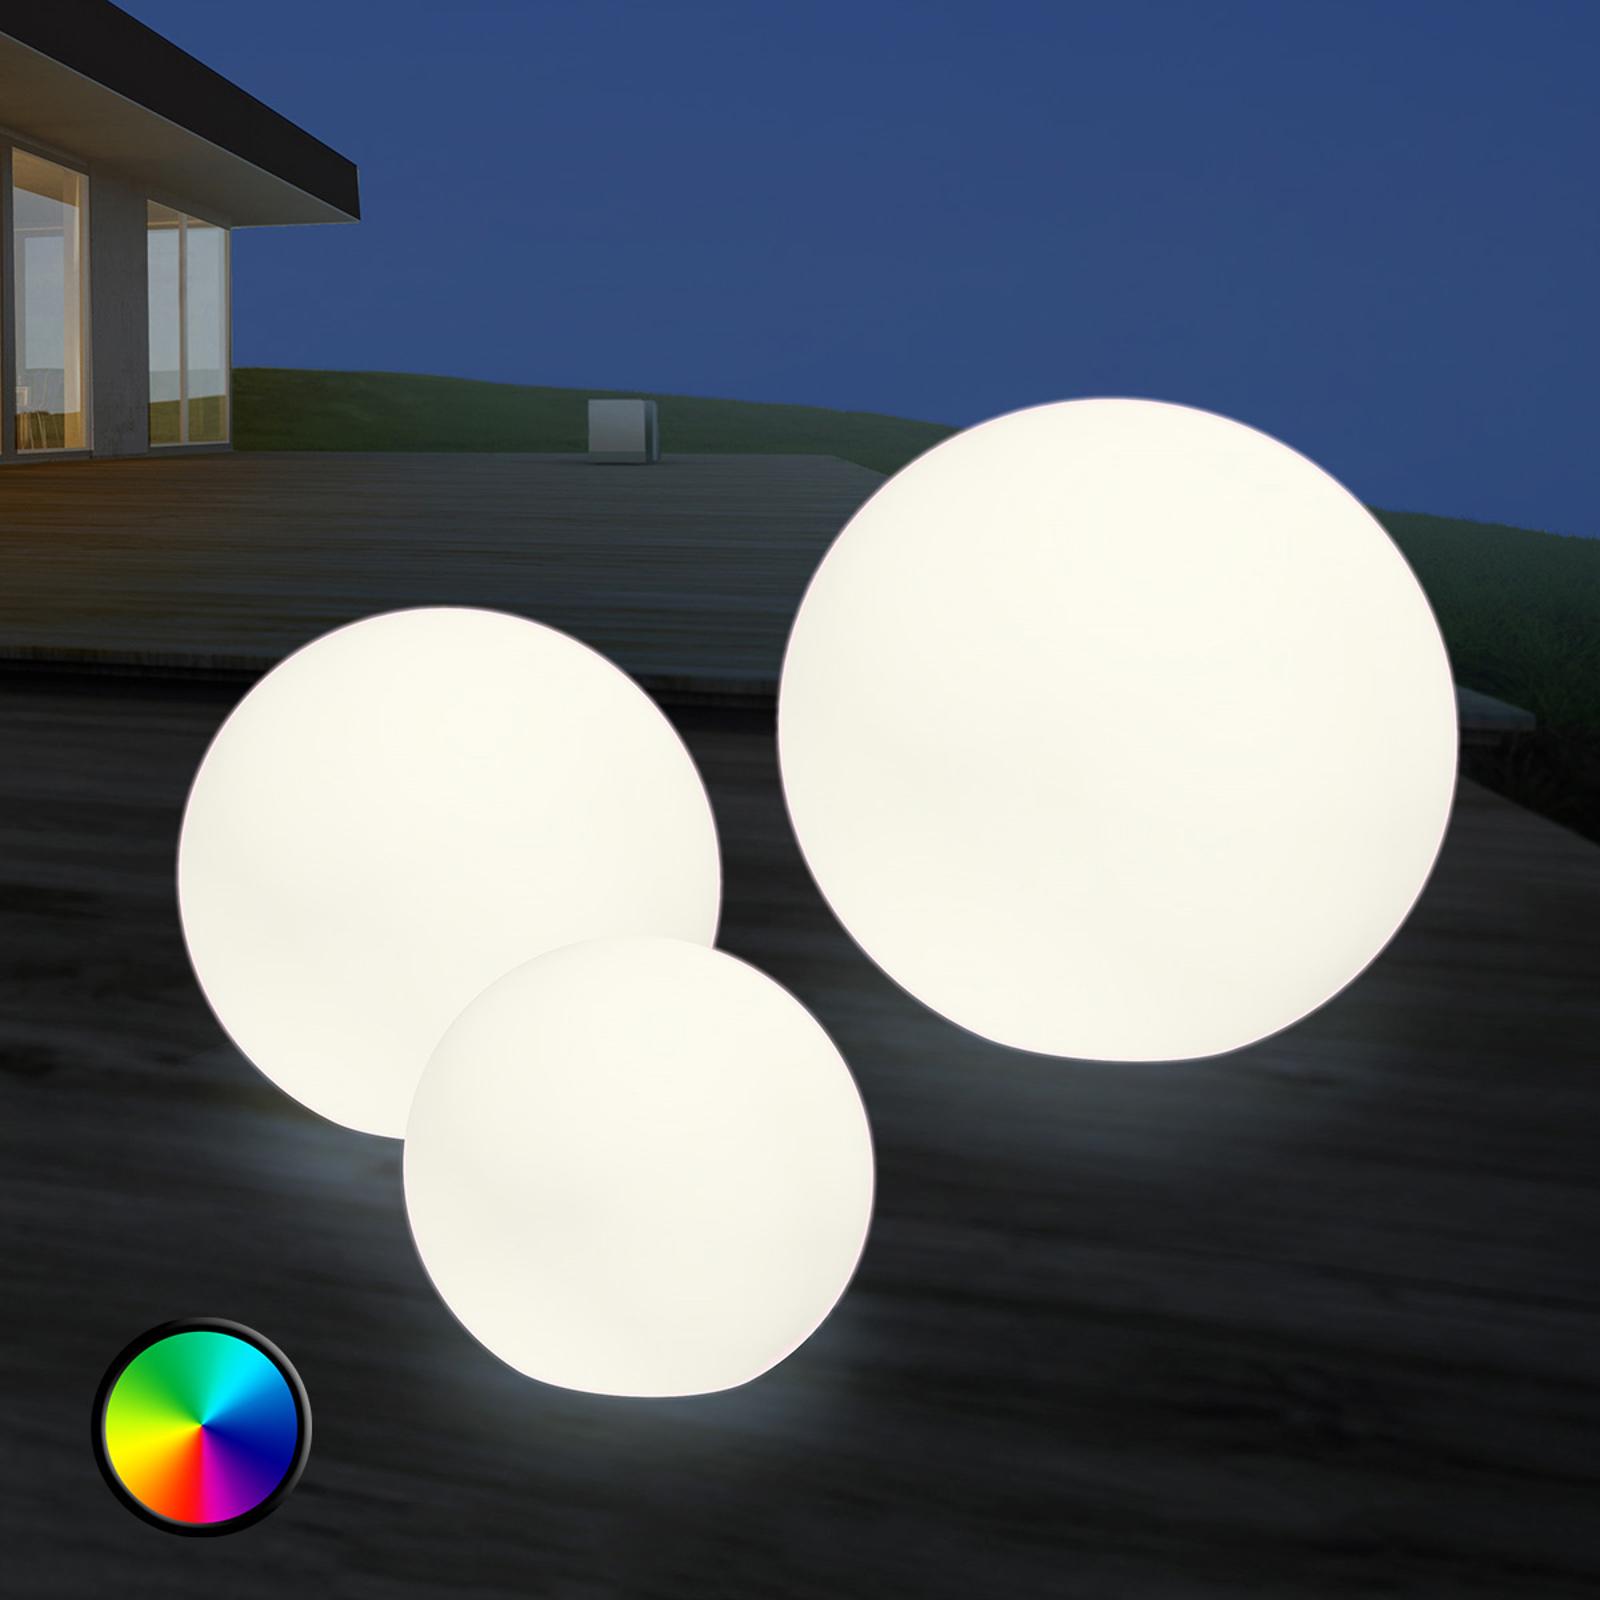 LED-ulkokoristevalaisin Shining Globe 30cm